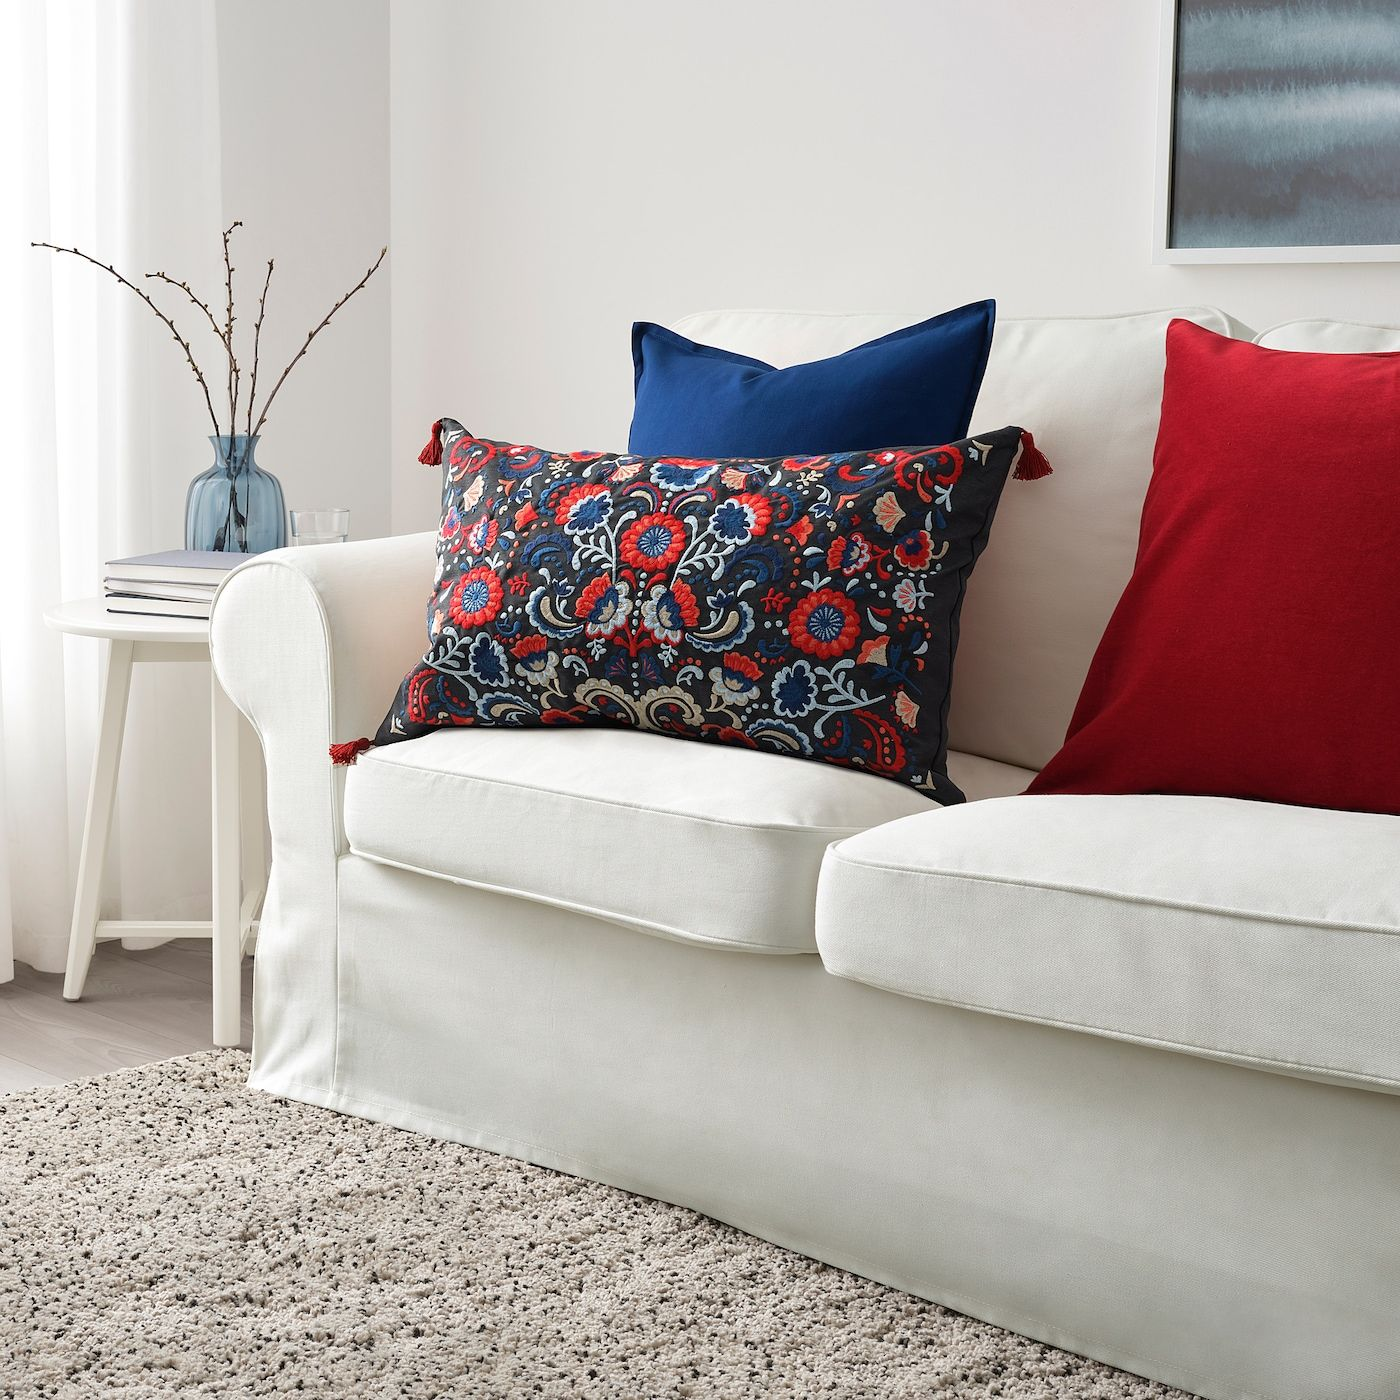 Skogskorn Pude Morkegra Multifarvet Ikea Cushions On Sofa Cushions Ikea Pillows